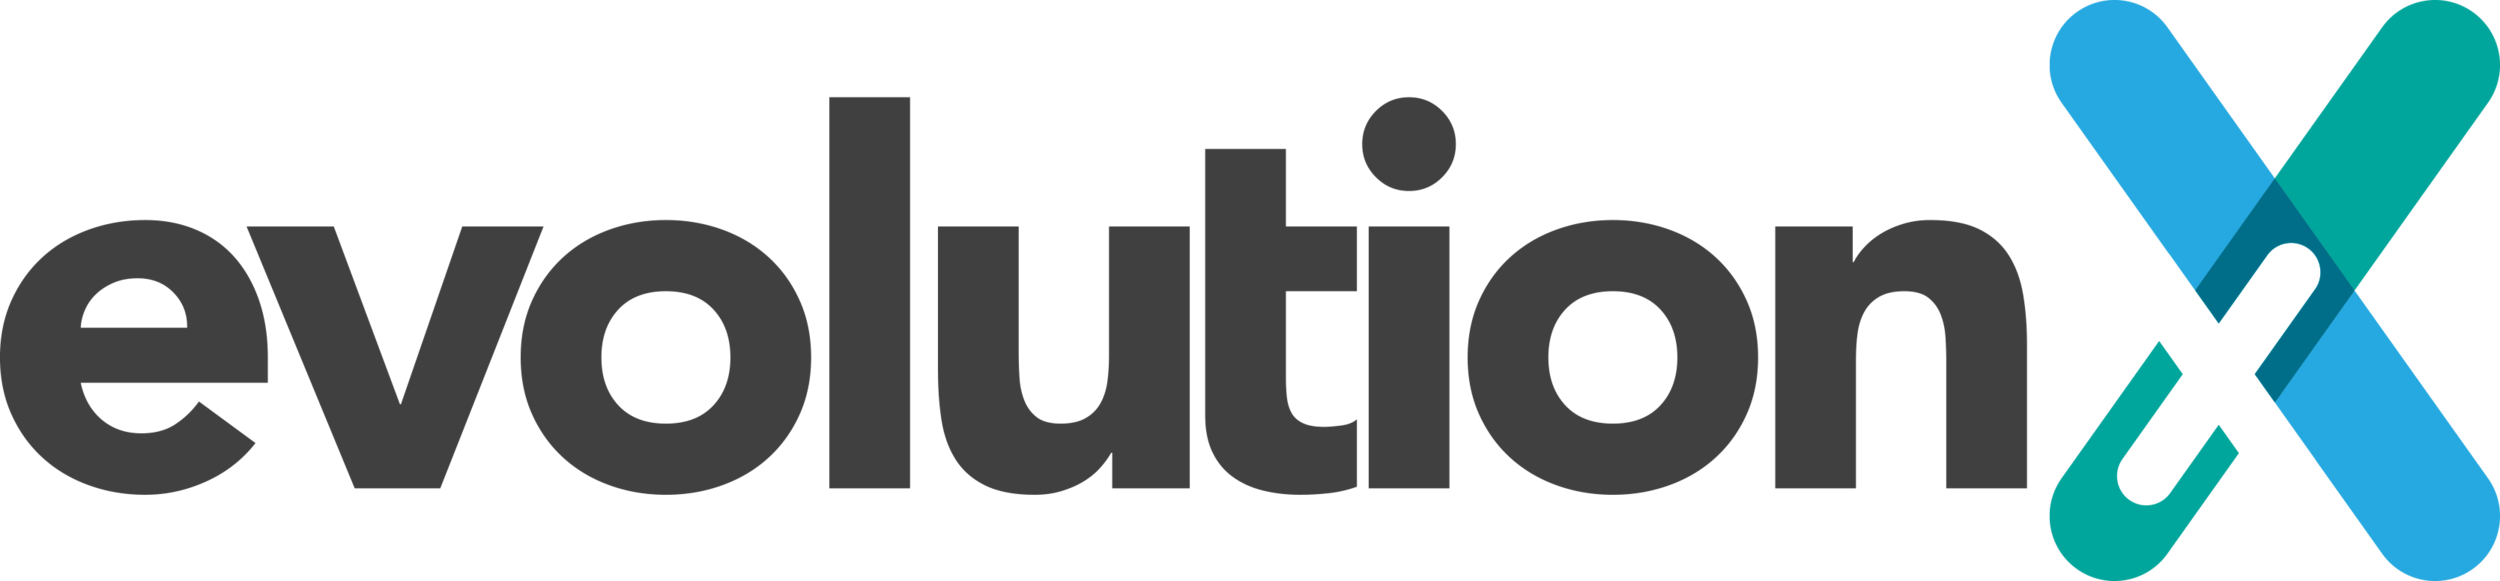 evolutionx_logo_trans_logo.png